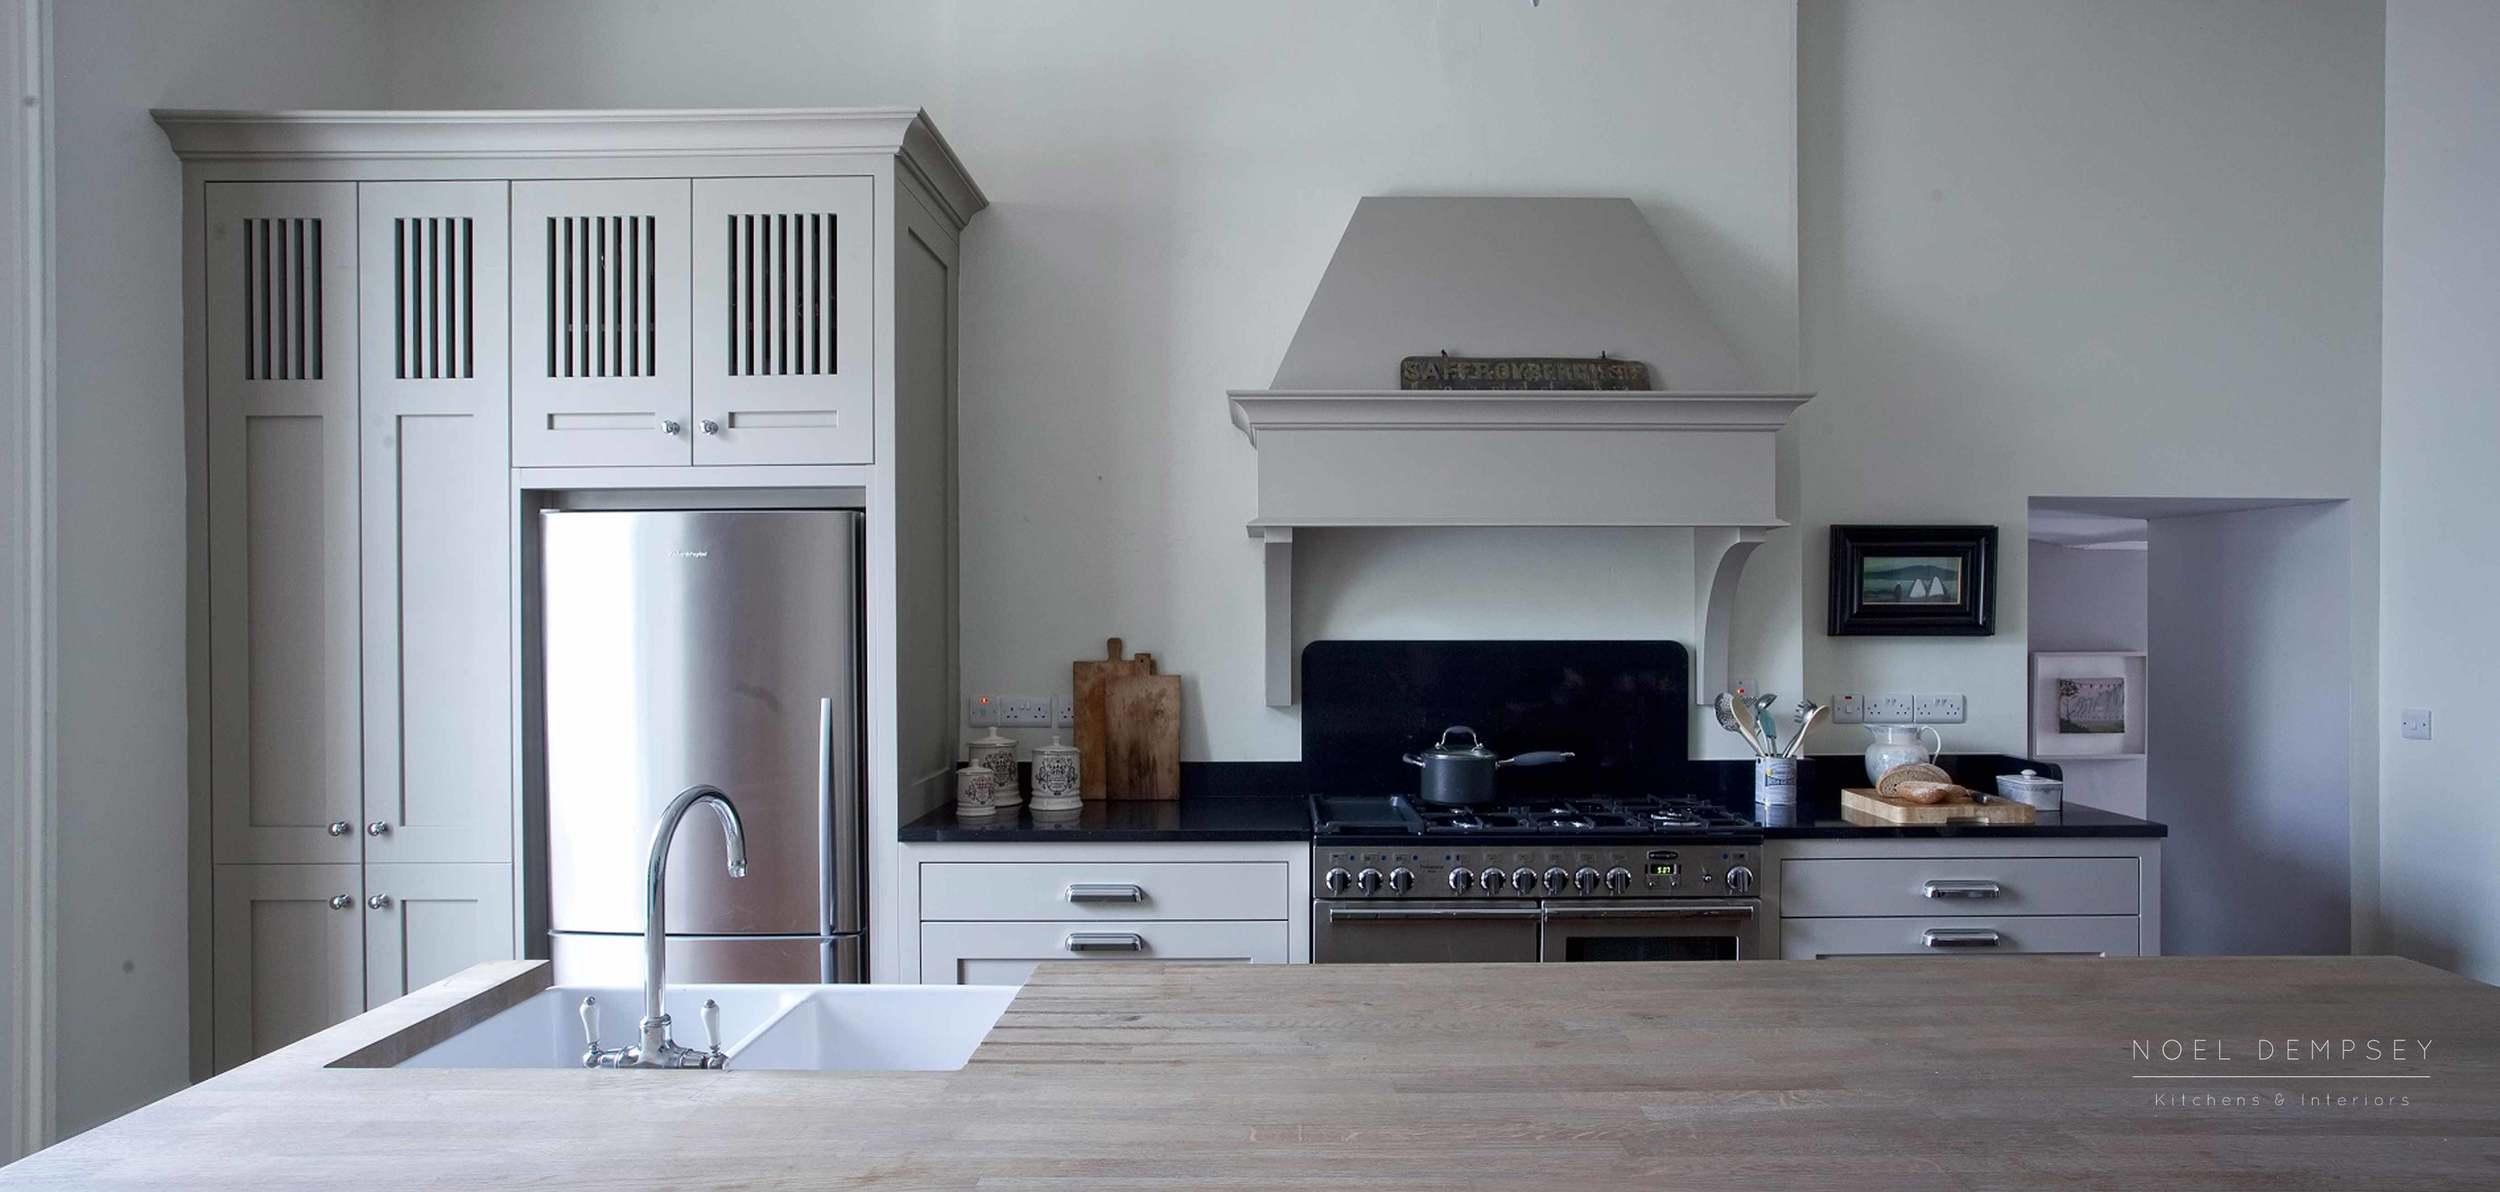 Belgrave-Plain-English-Kitchens-Ireland-2.jpg